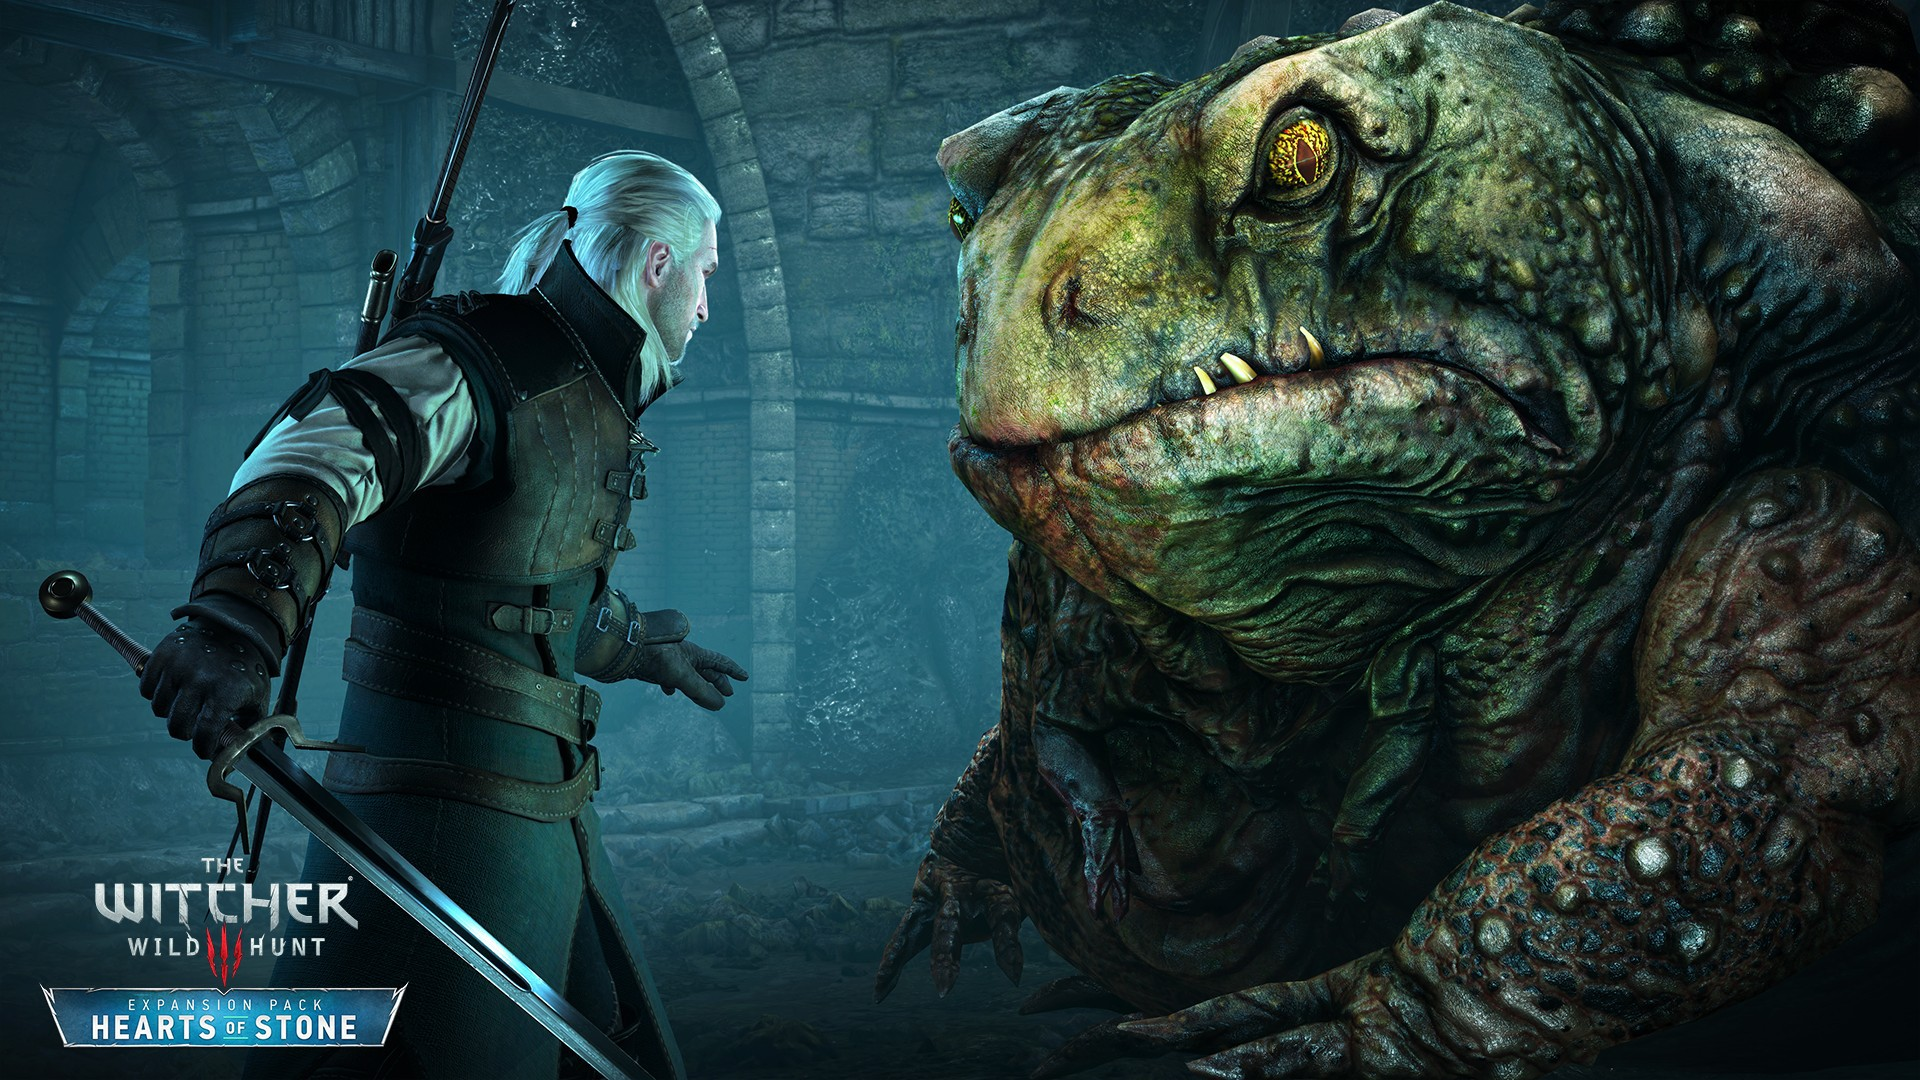 تریلر The Witcher 3: Hearts of Stone